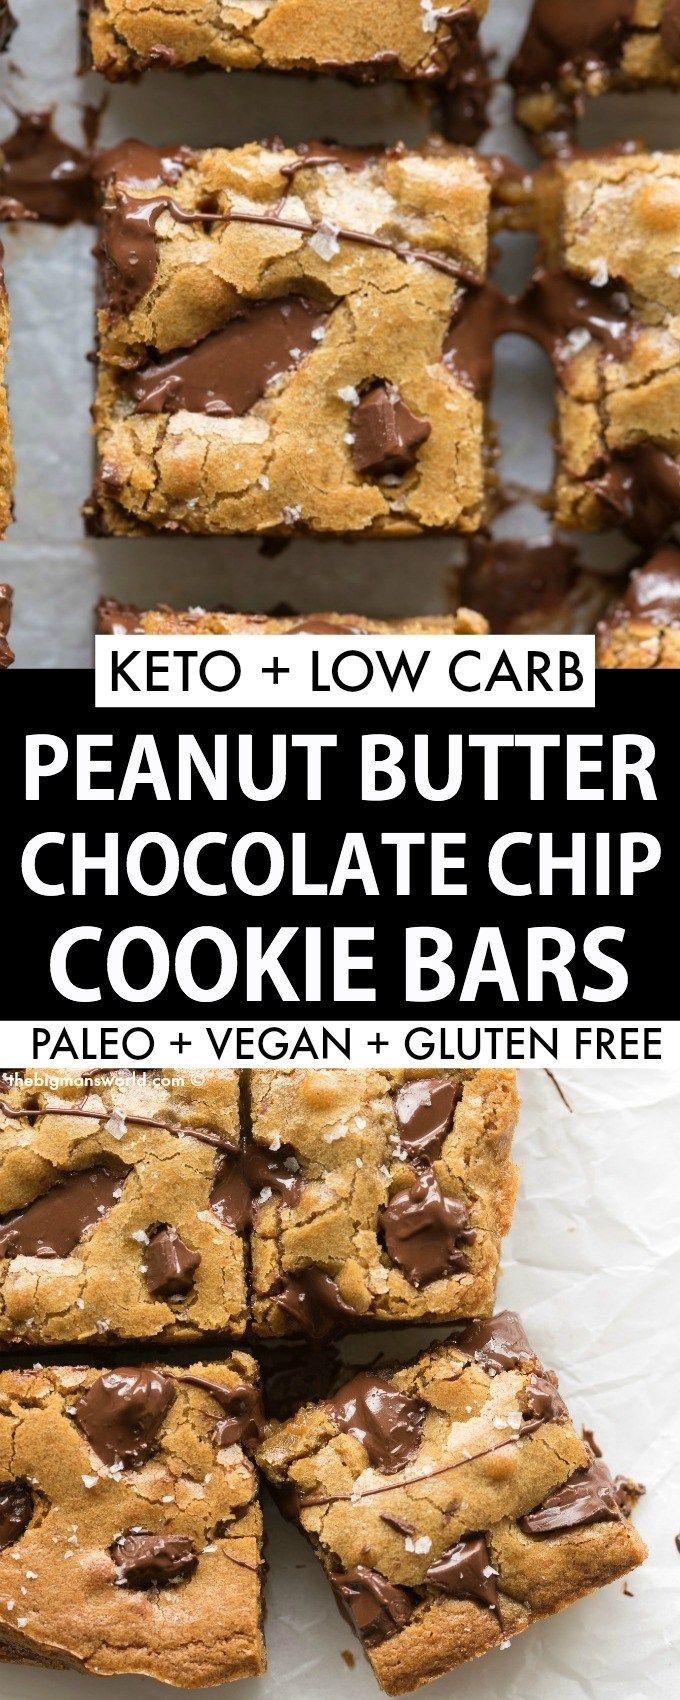 Keto Peanut Butter Chocolate Chip Cookie Bars Recipe Chocolate